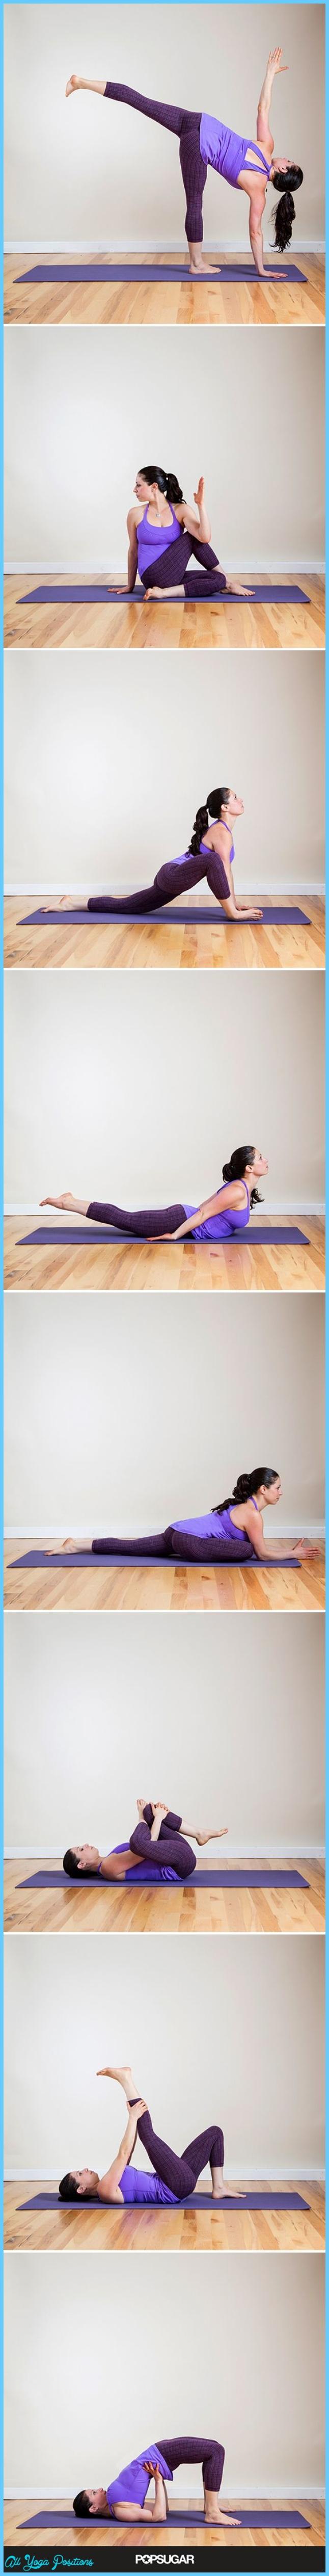 Yoga: Sciatica Yoga